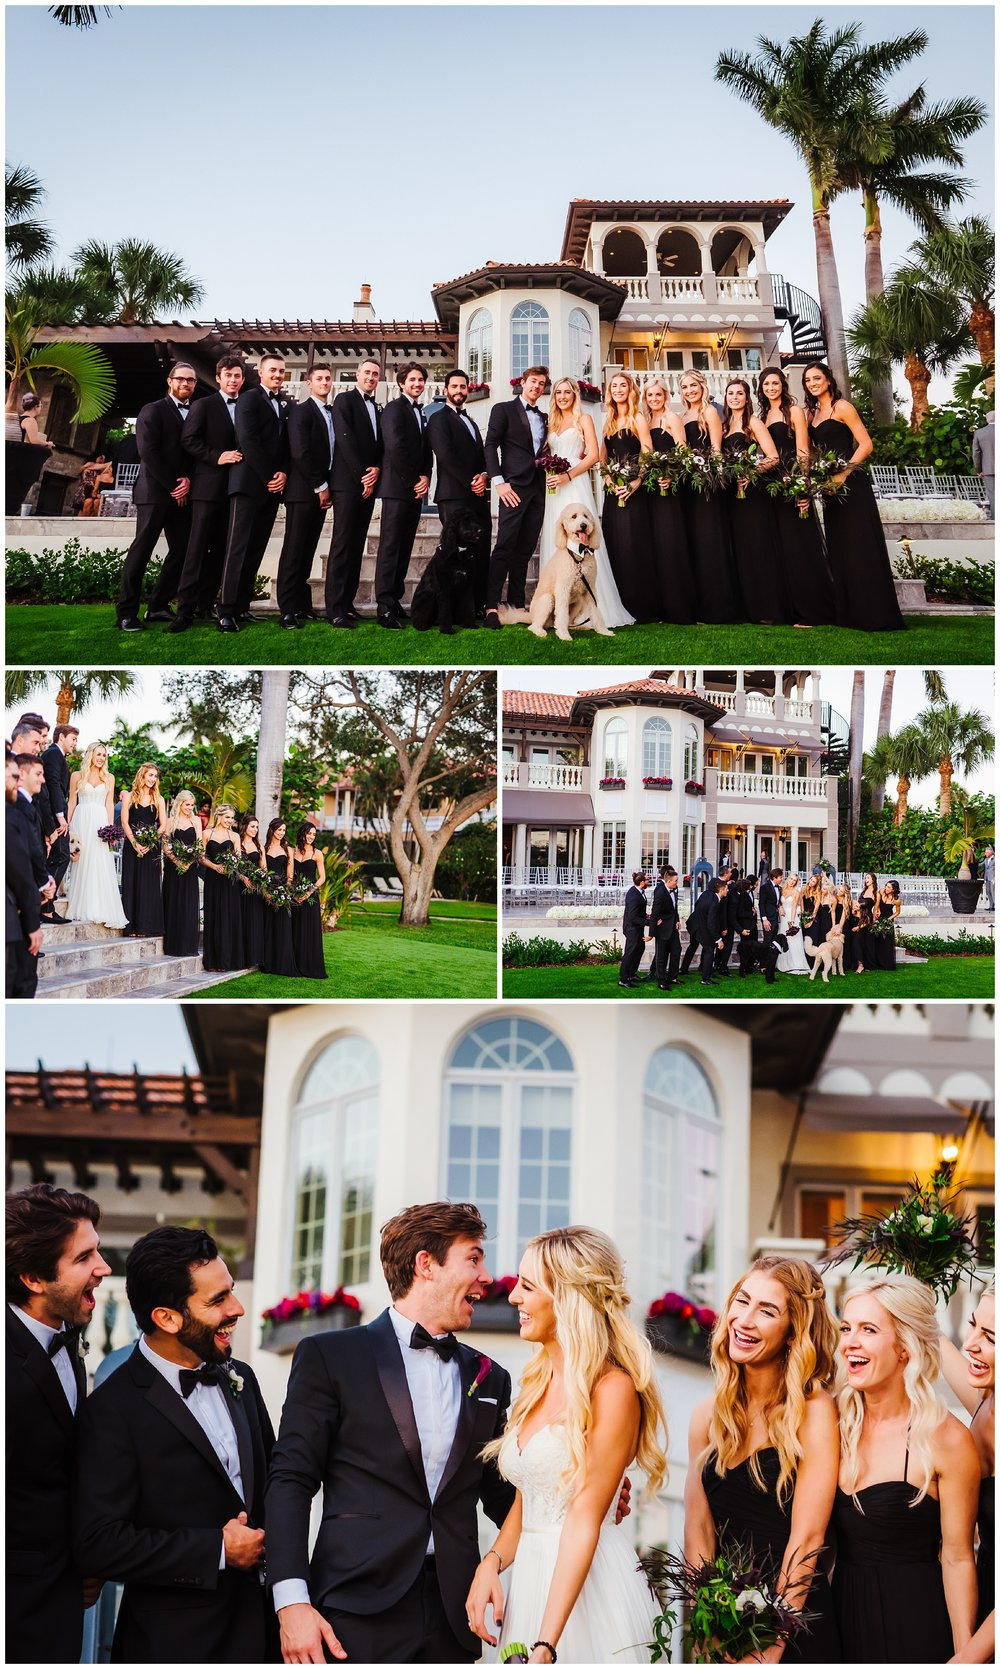 st-pete-wedding-photographer-backyard-luxury-snell-isle-vinoy_0049.jpg